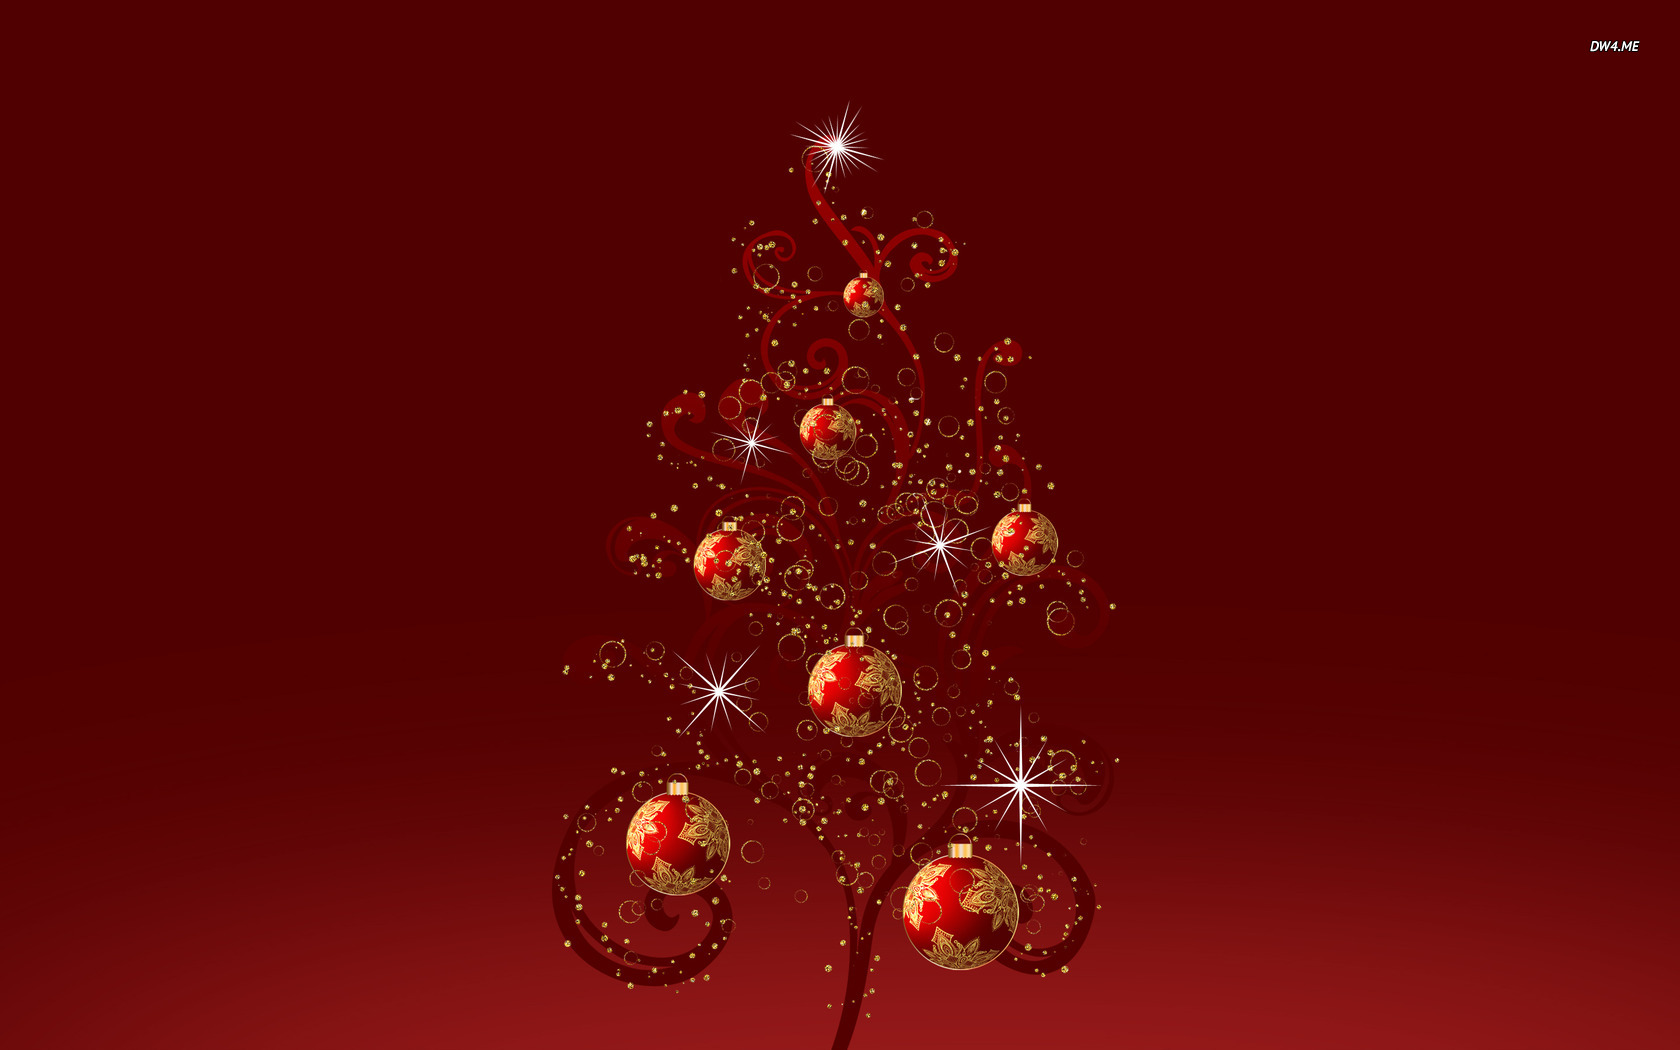 993 sparkling christmas tree 1680x1050 holiday wallpaperjpg 1680x1050